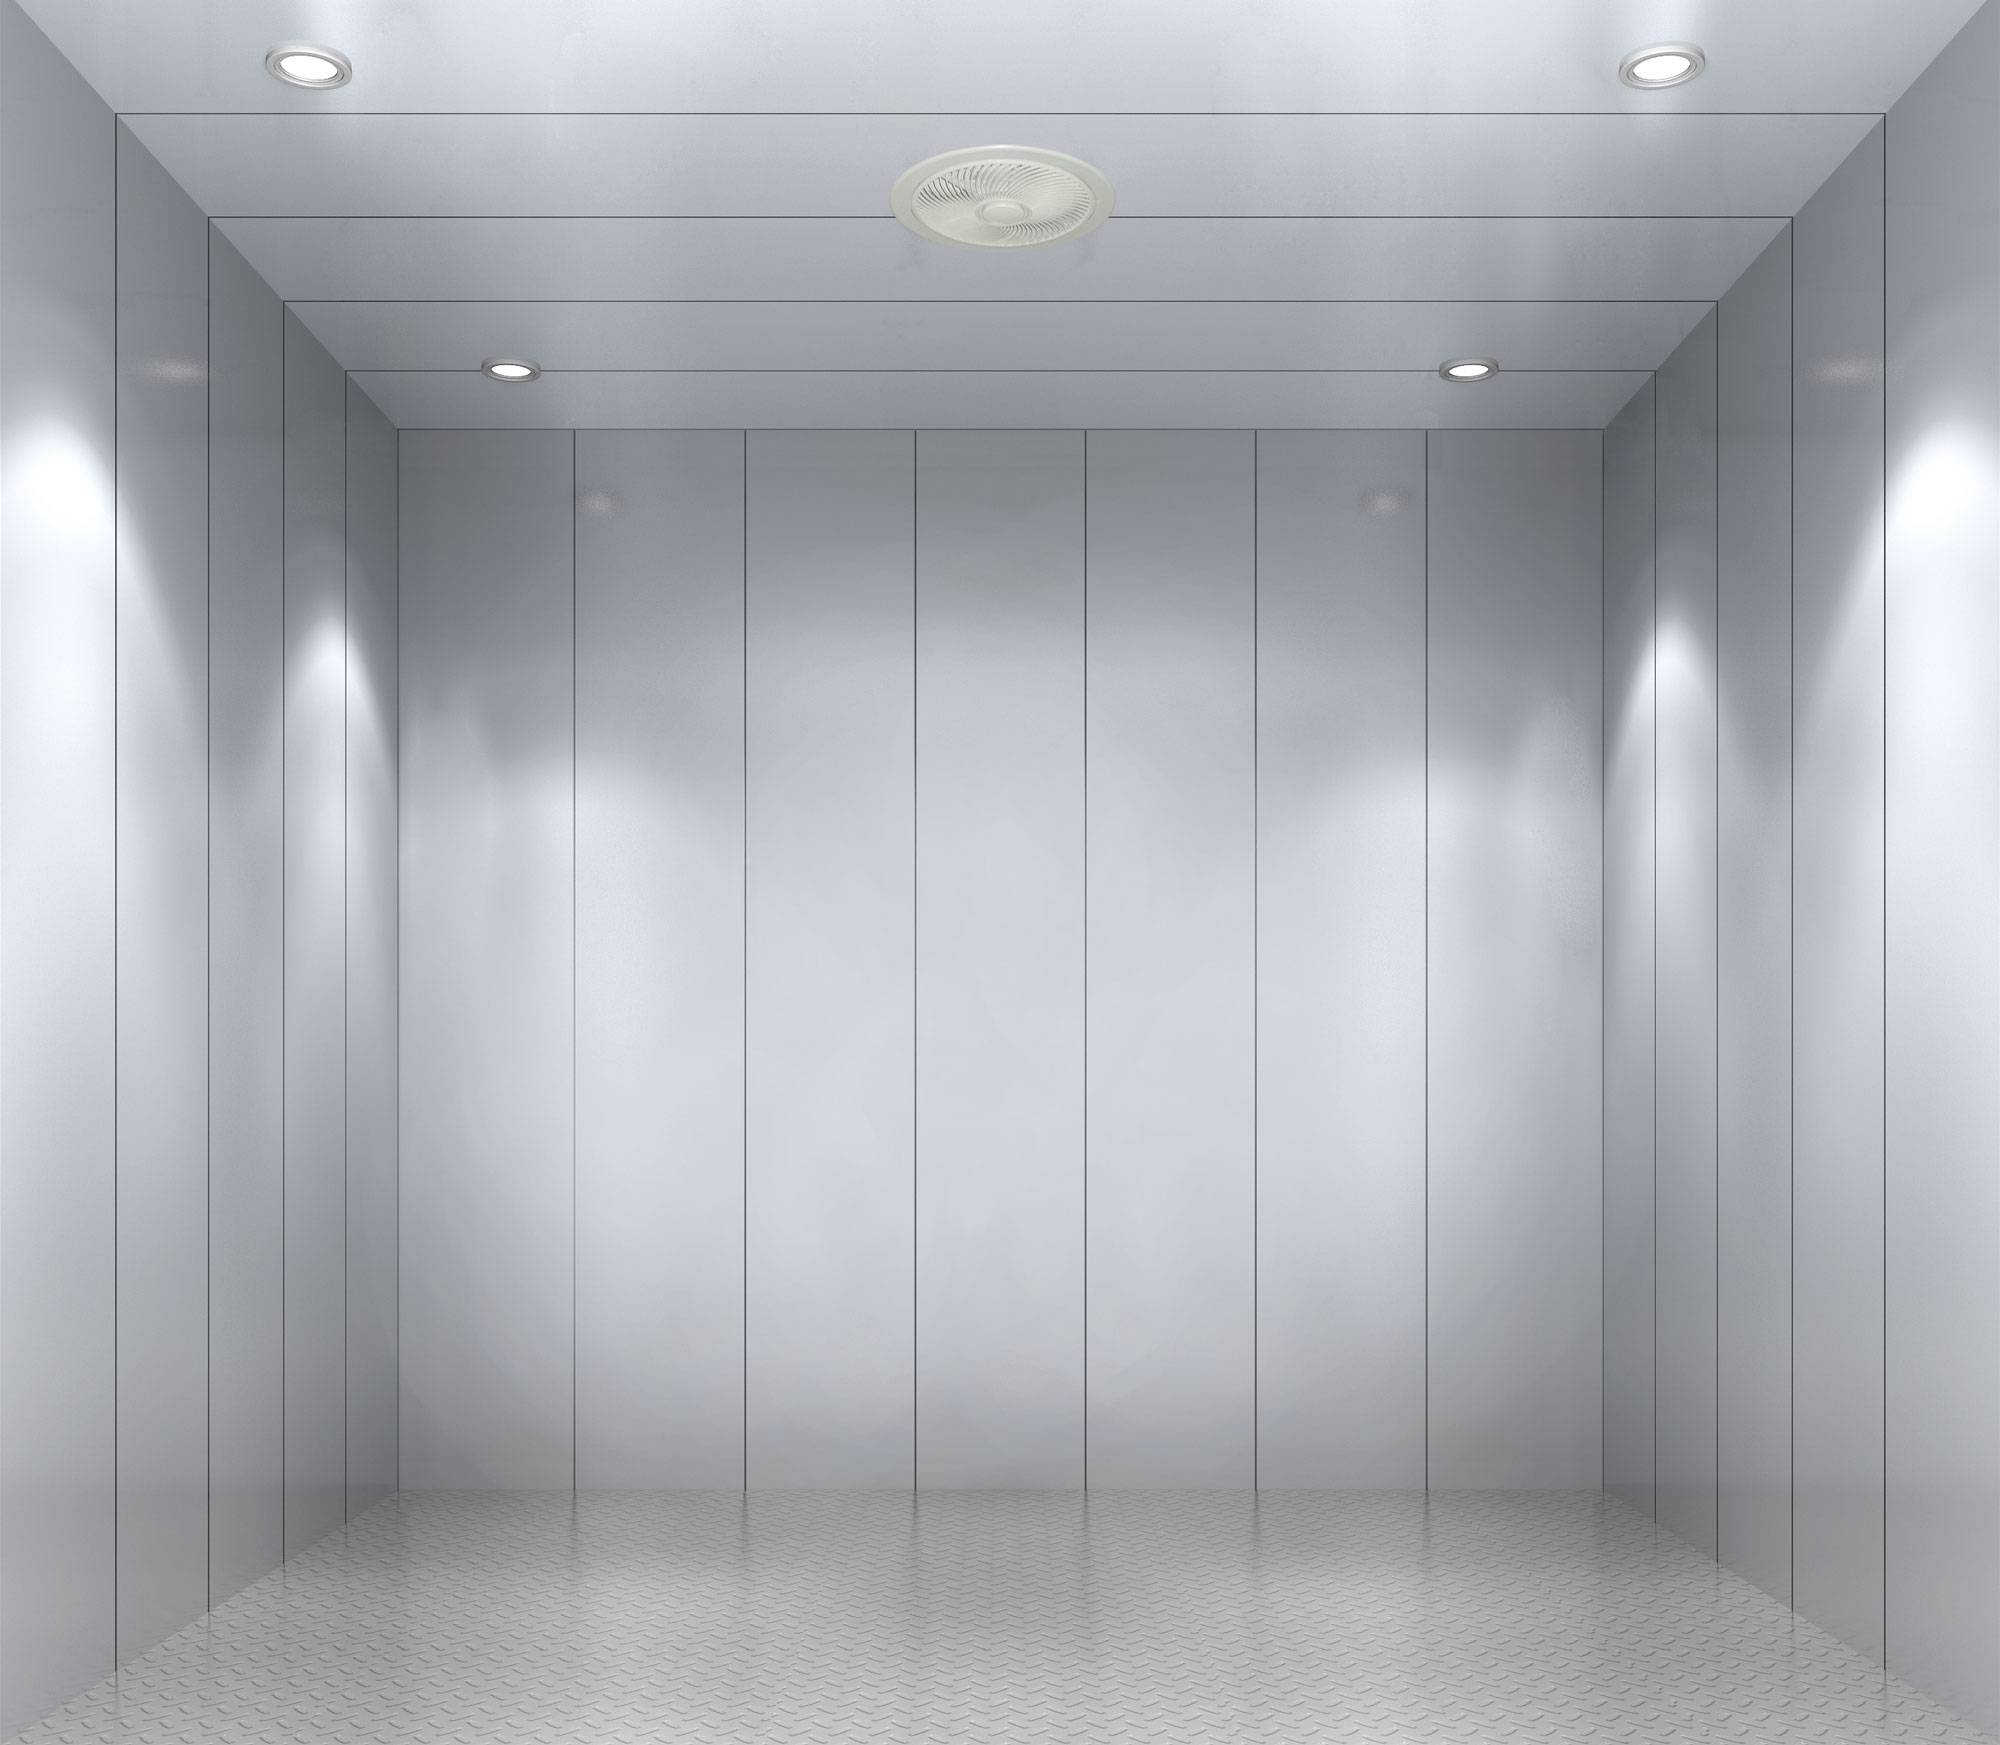 Freight Elevator HK-F001